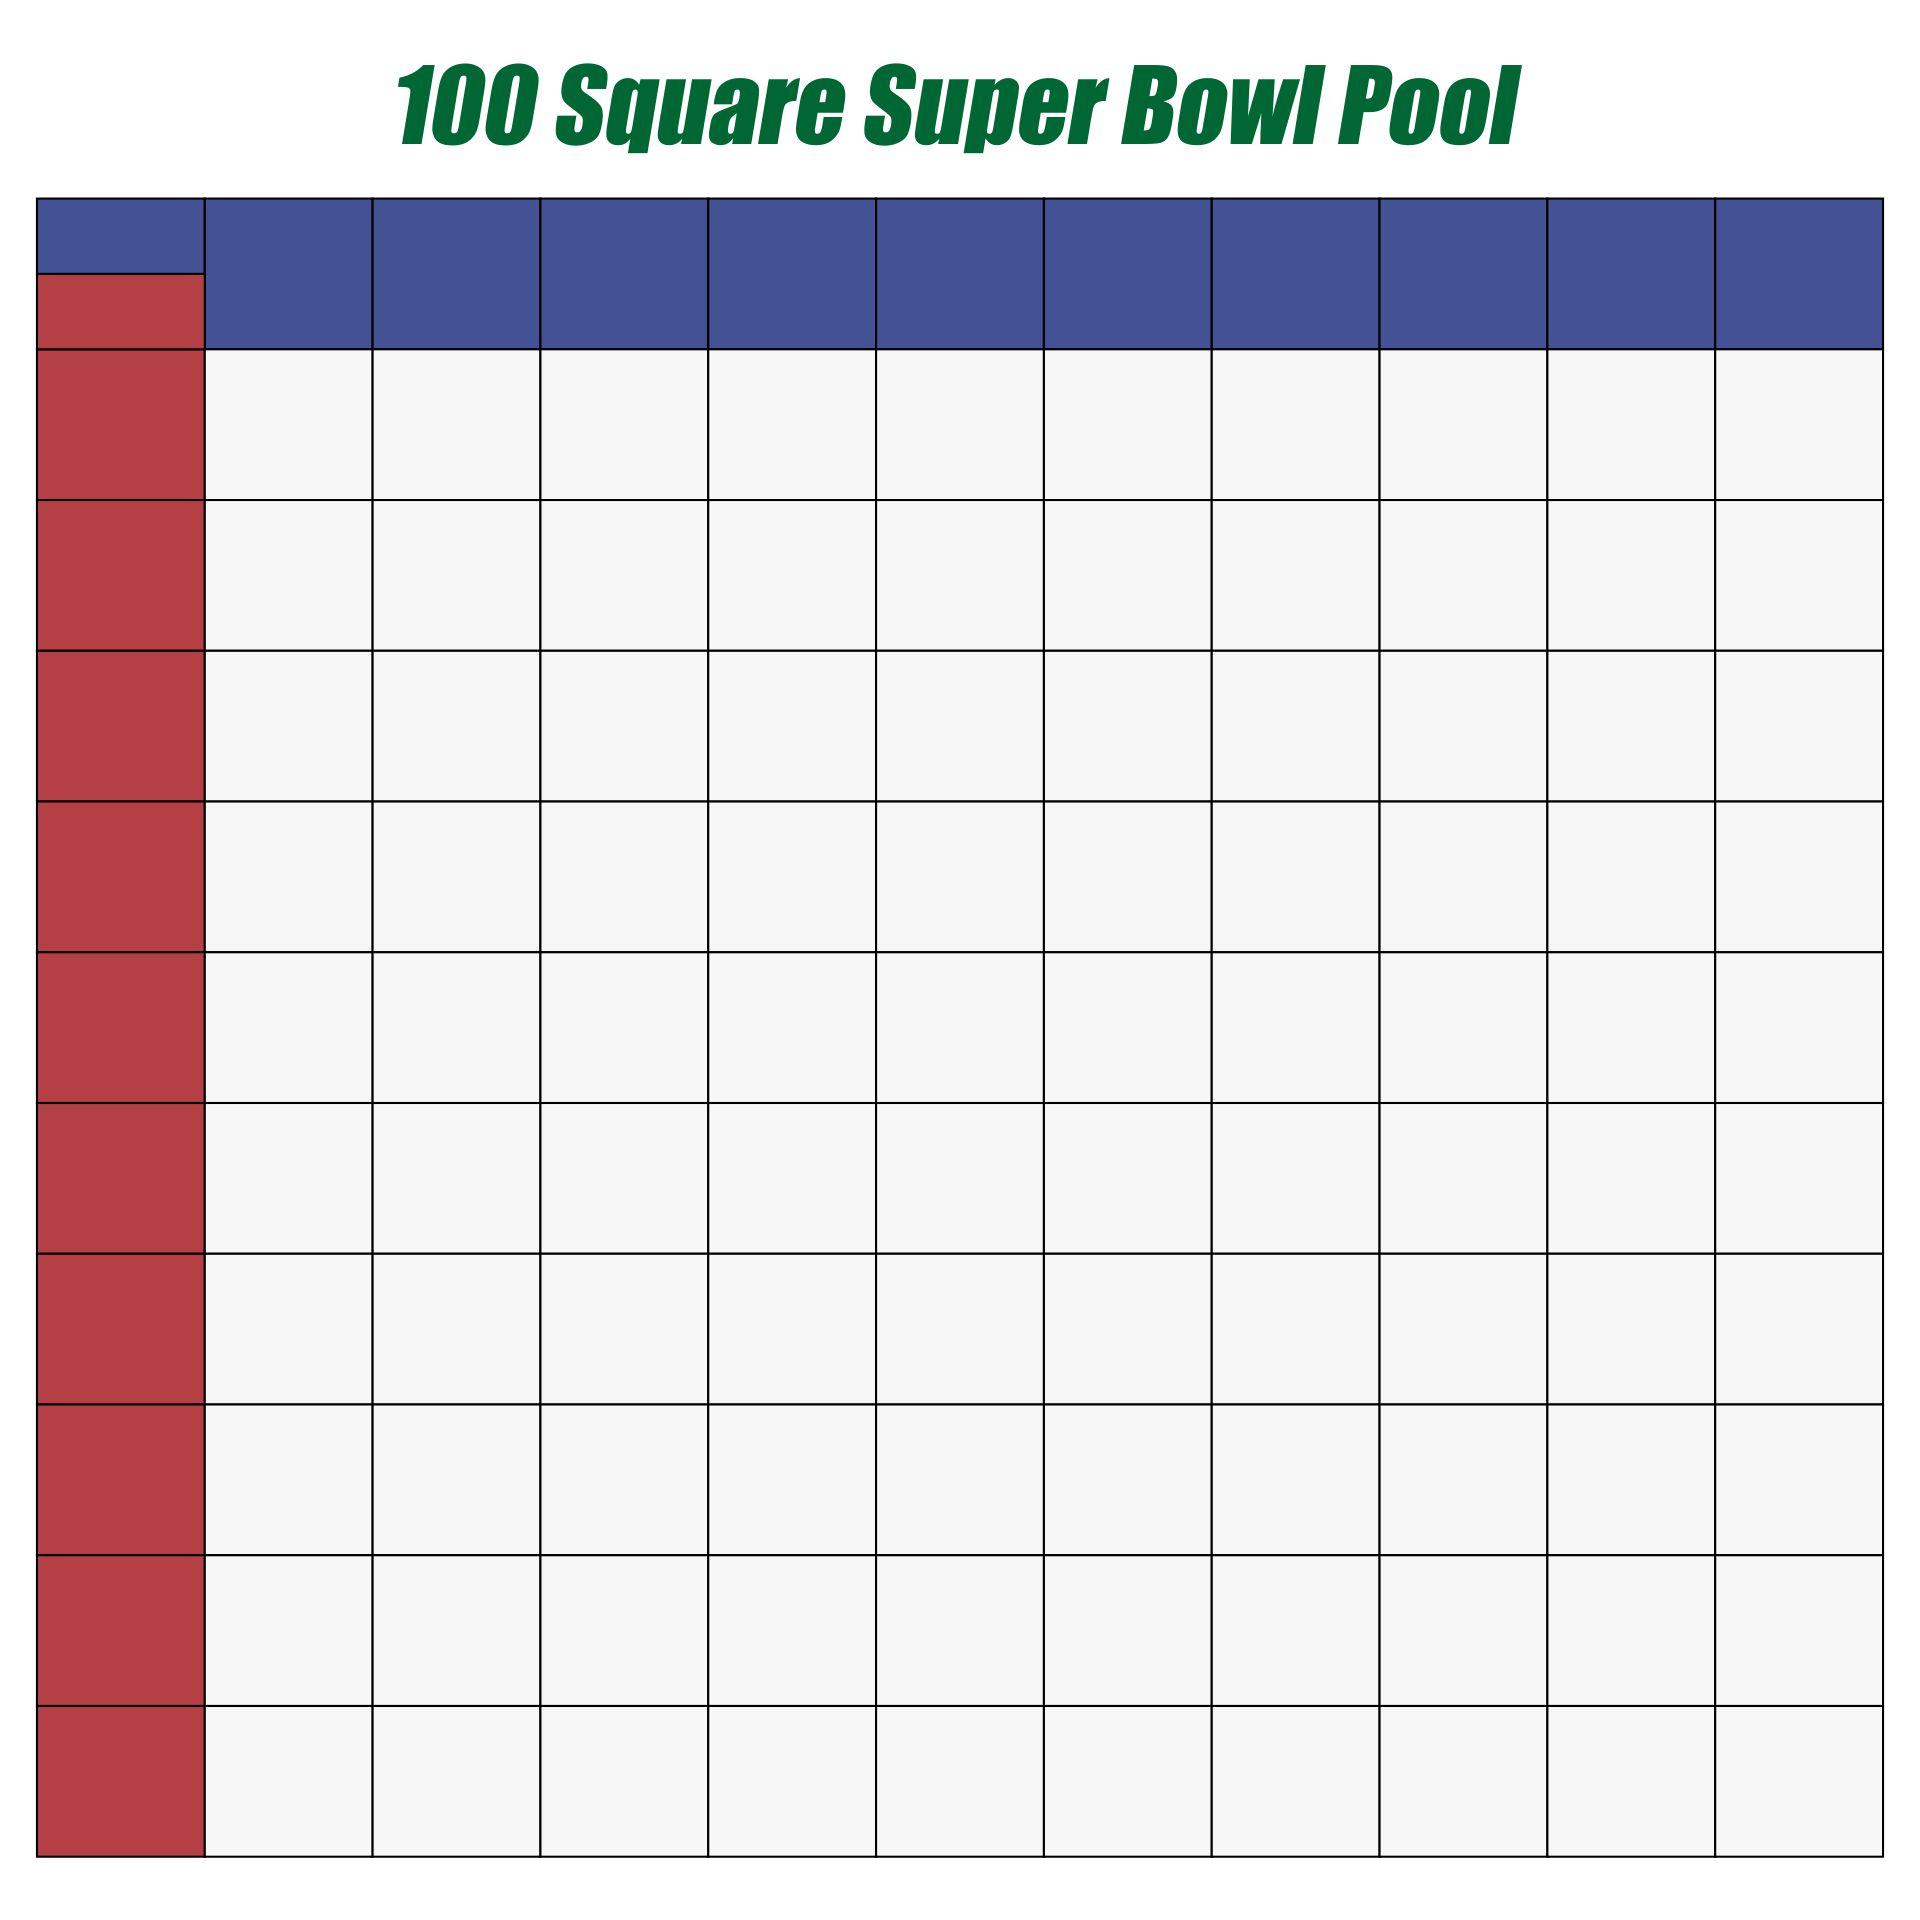 Printable 100 Square Super Bowl Pool Template